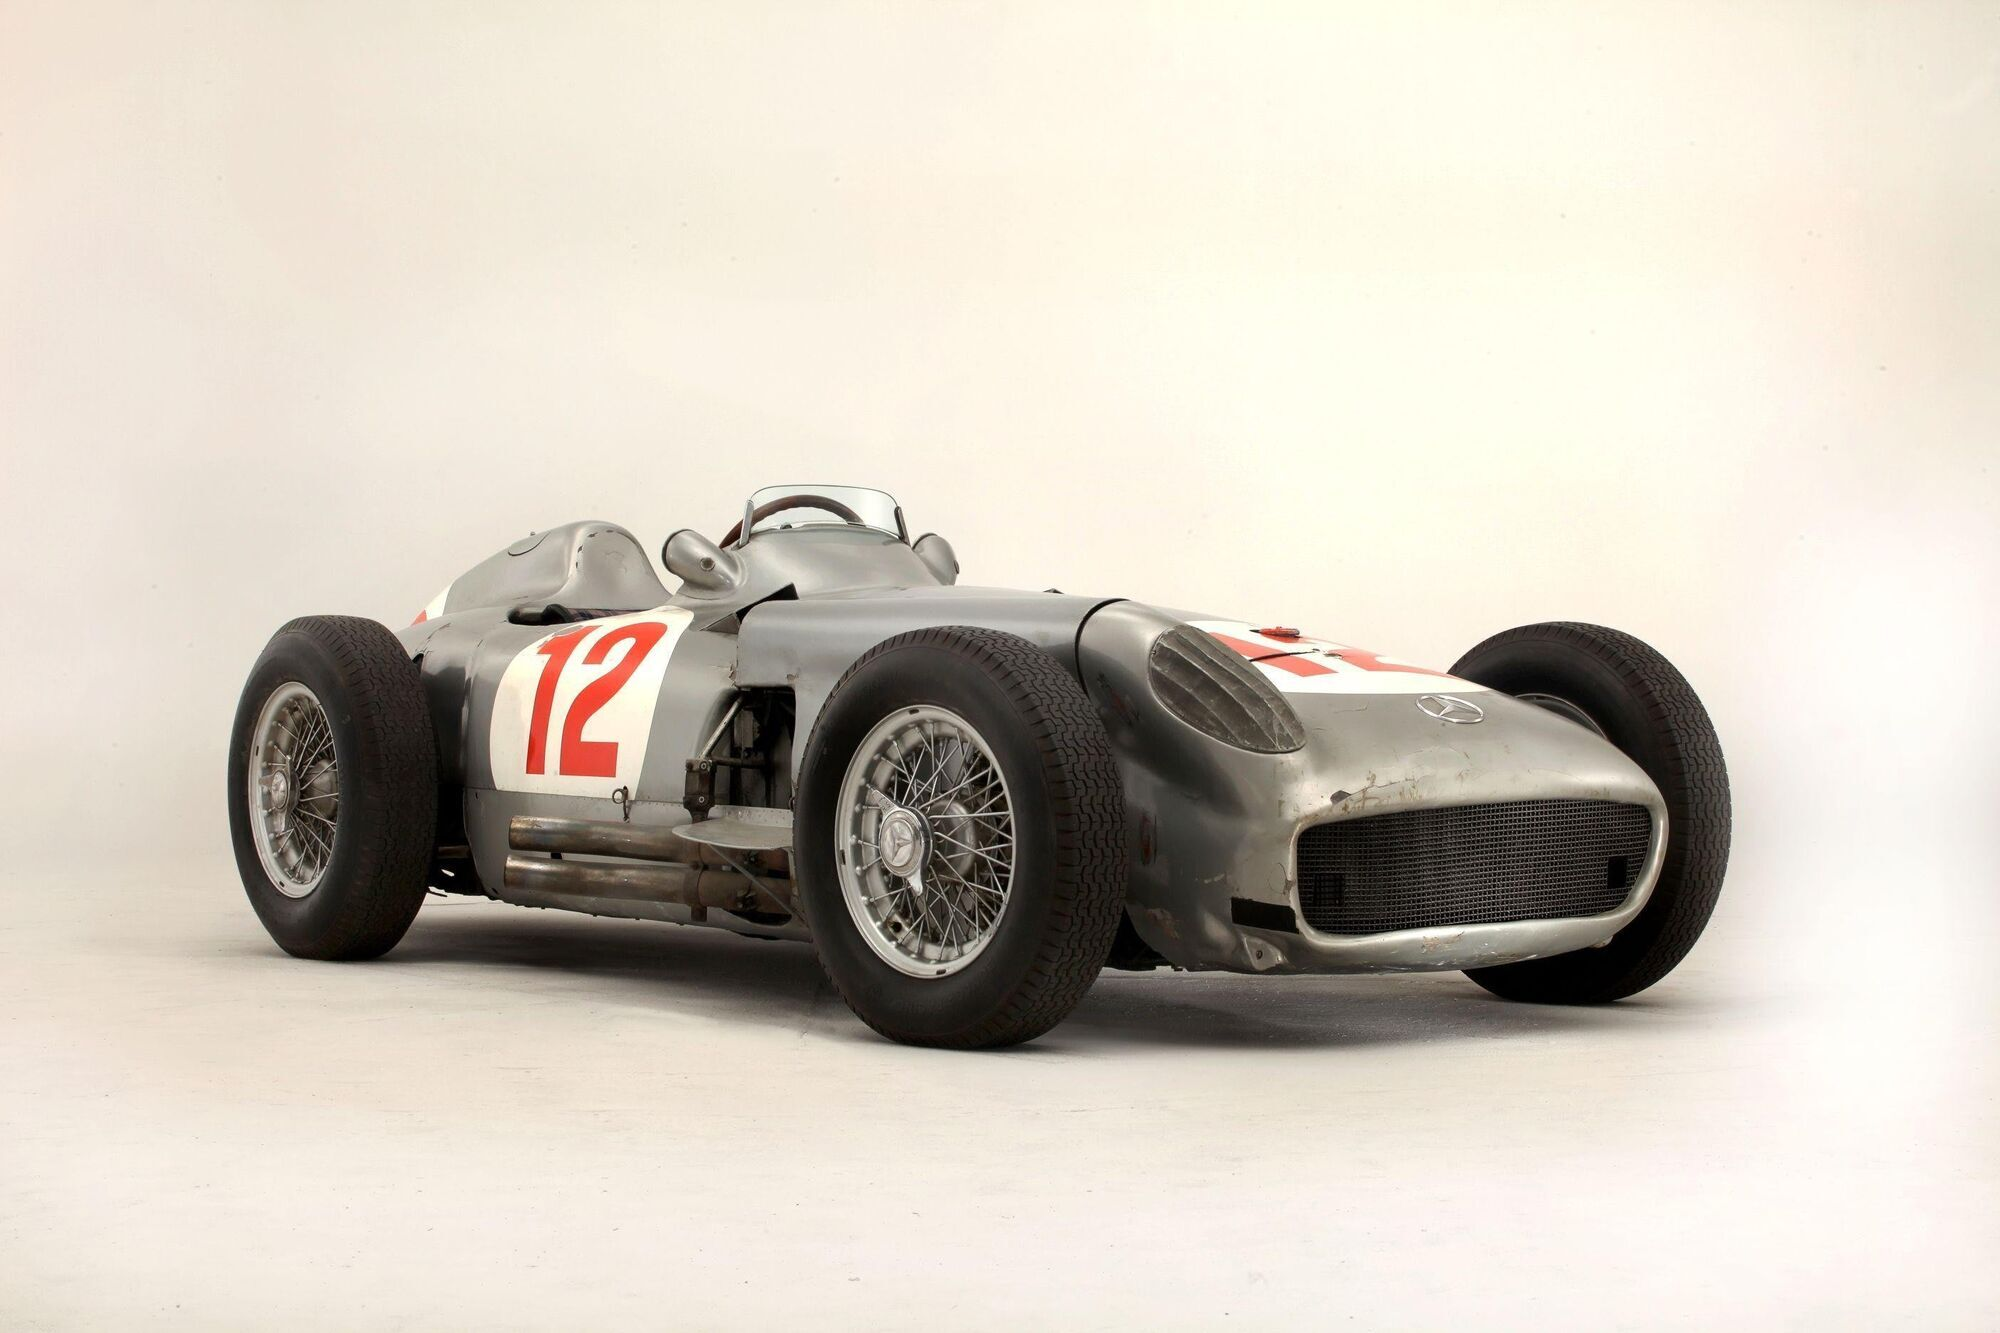 Mercedes-Benz W196, который выиграл Формулу-1 в 1954 году